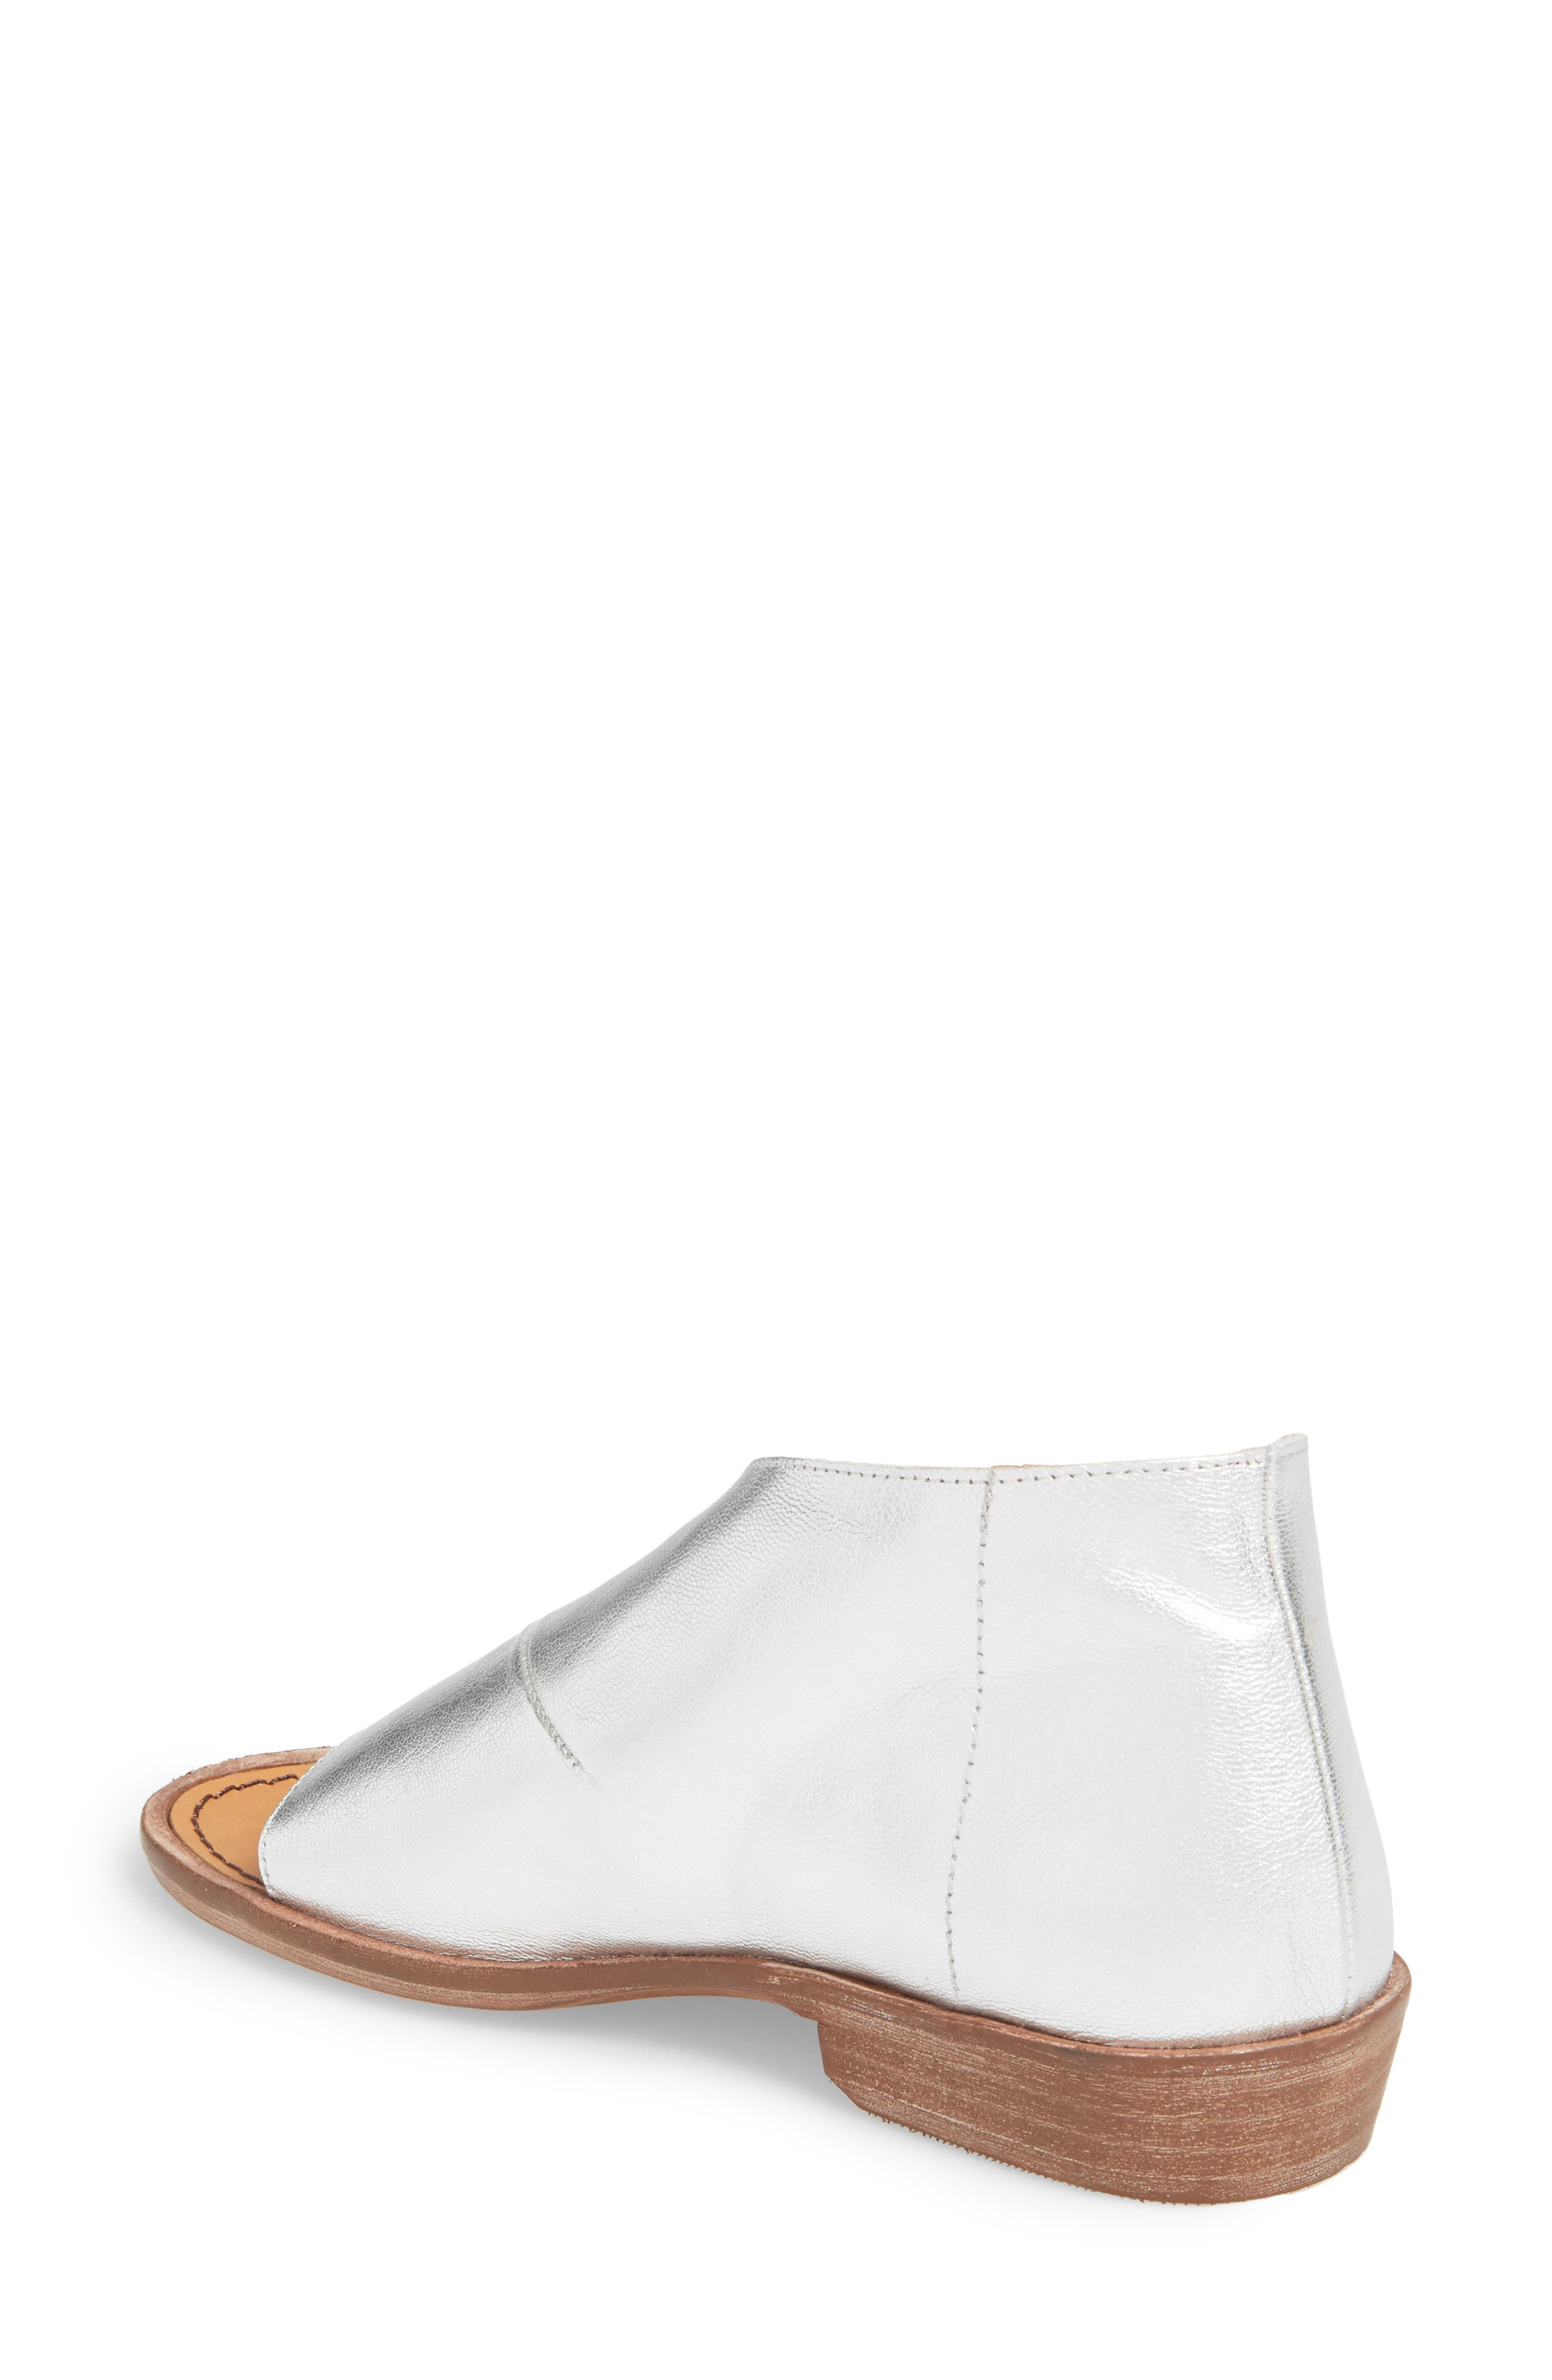 'Mont Blanc' Asymmetrical Sandal,                             Alternate thumbnail 16, color,